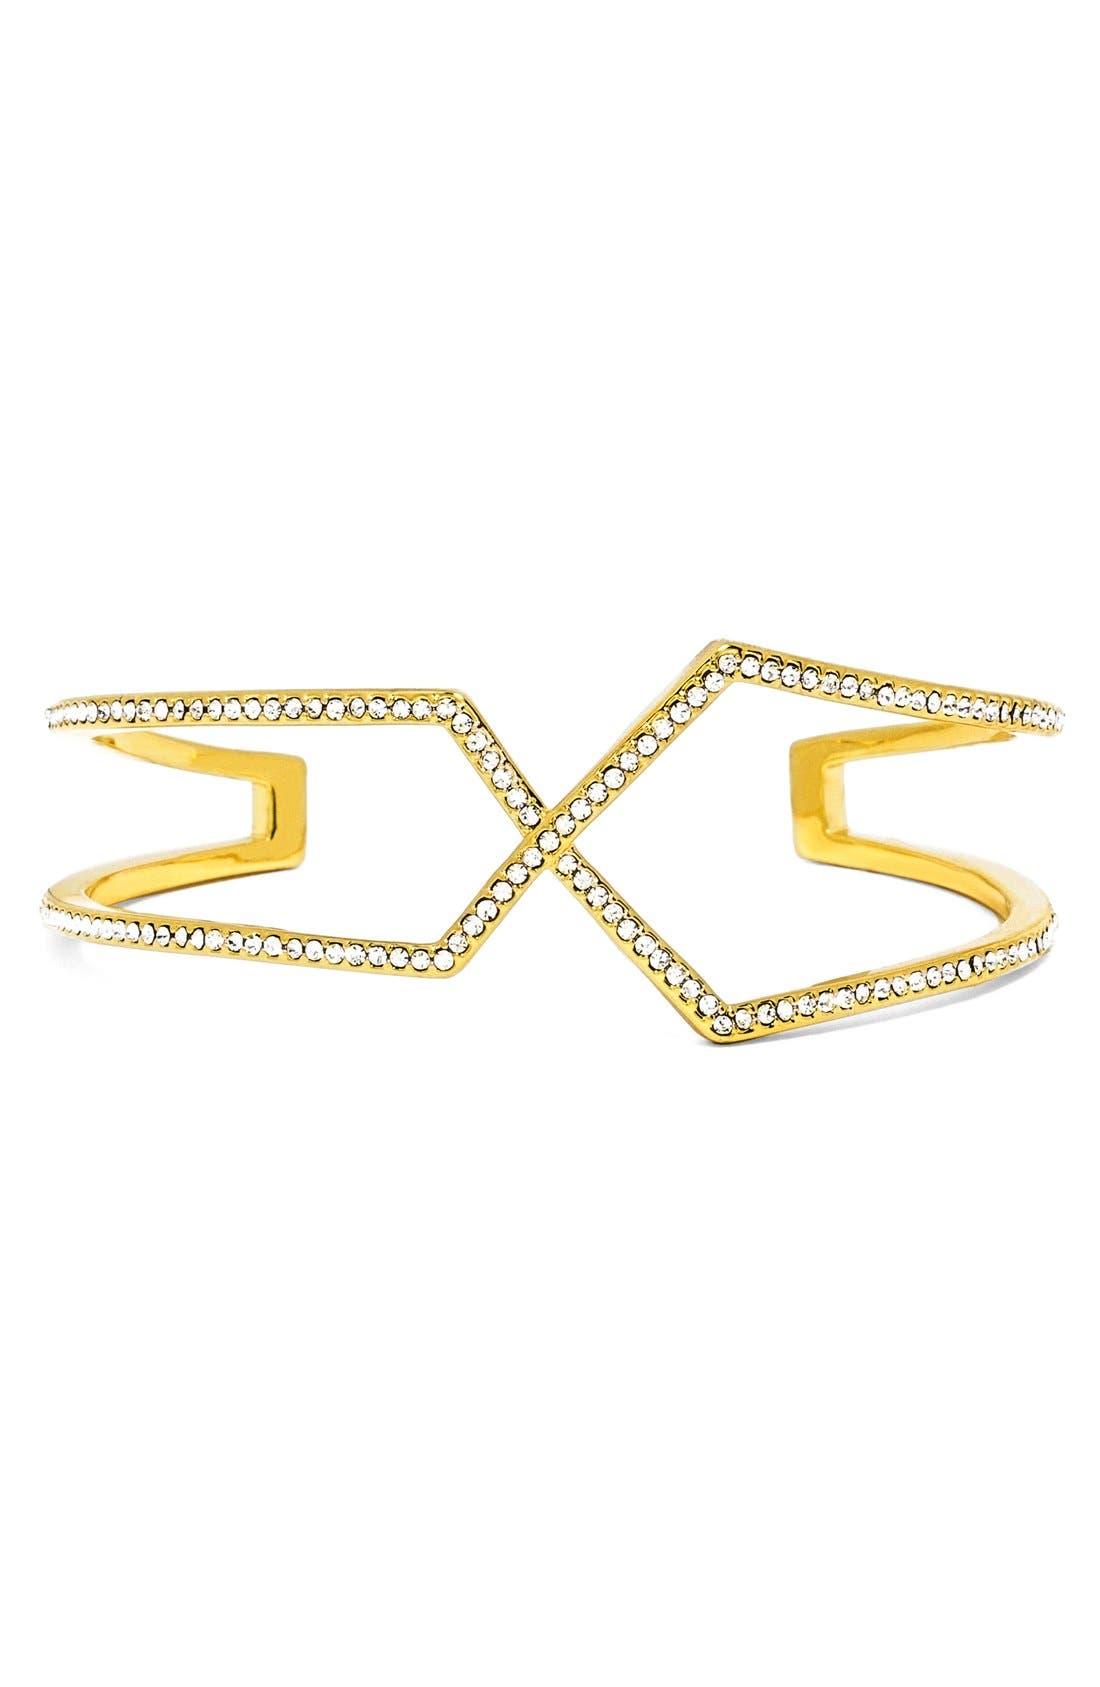 Alternate Image 1 Selected - BaubleBar'Siphon' Cuff Bracelet